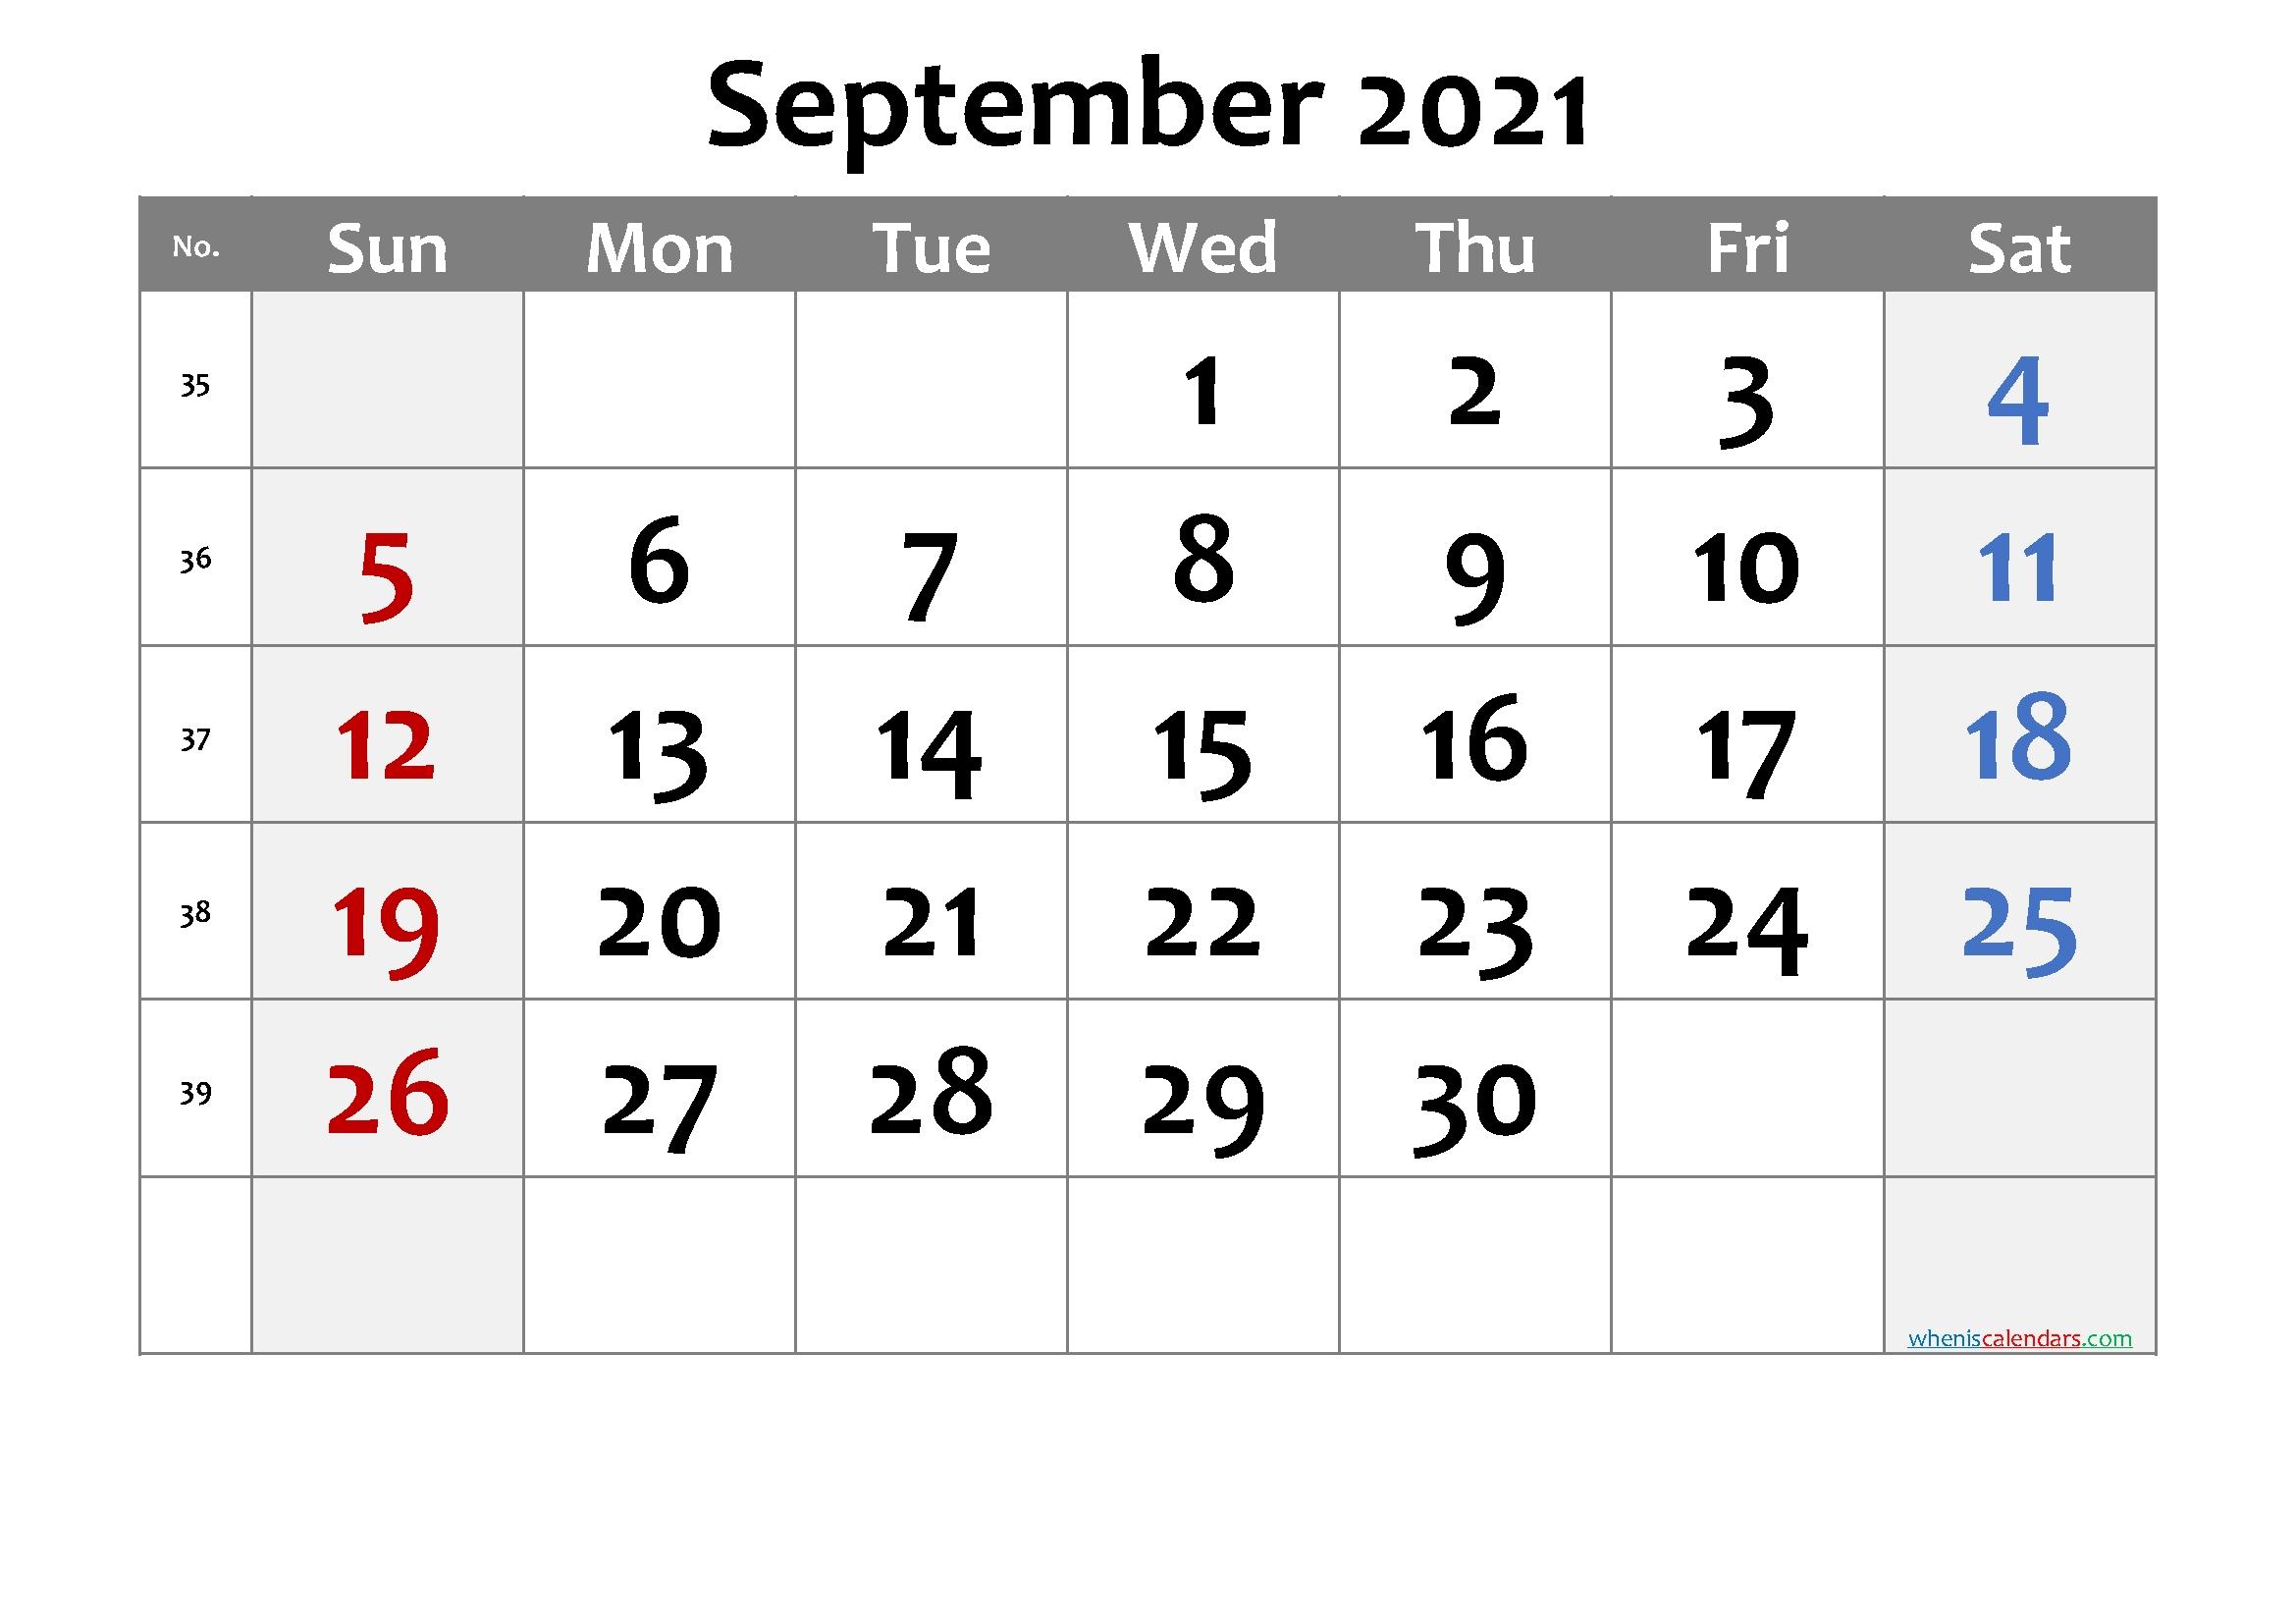 Get June To September 2021 Calendar